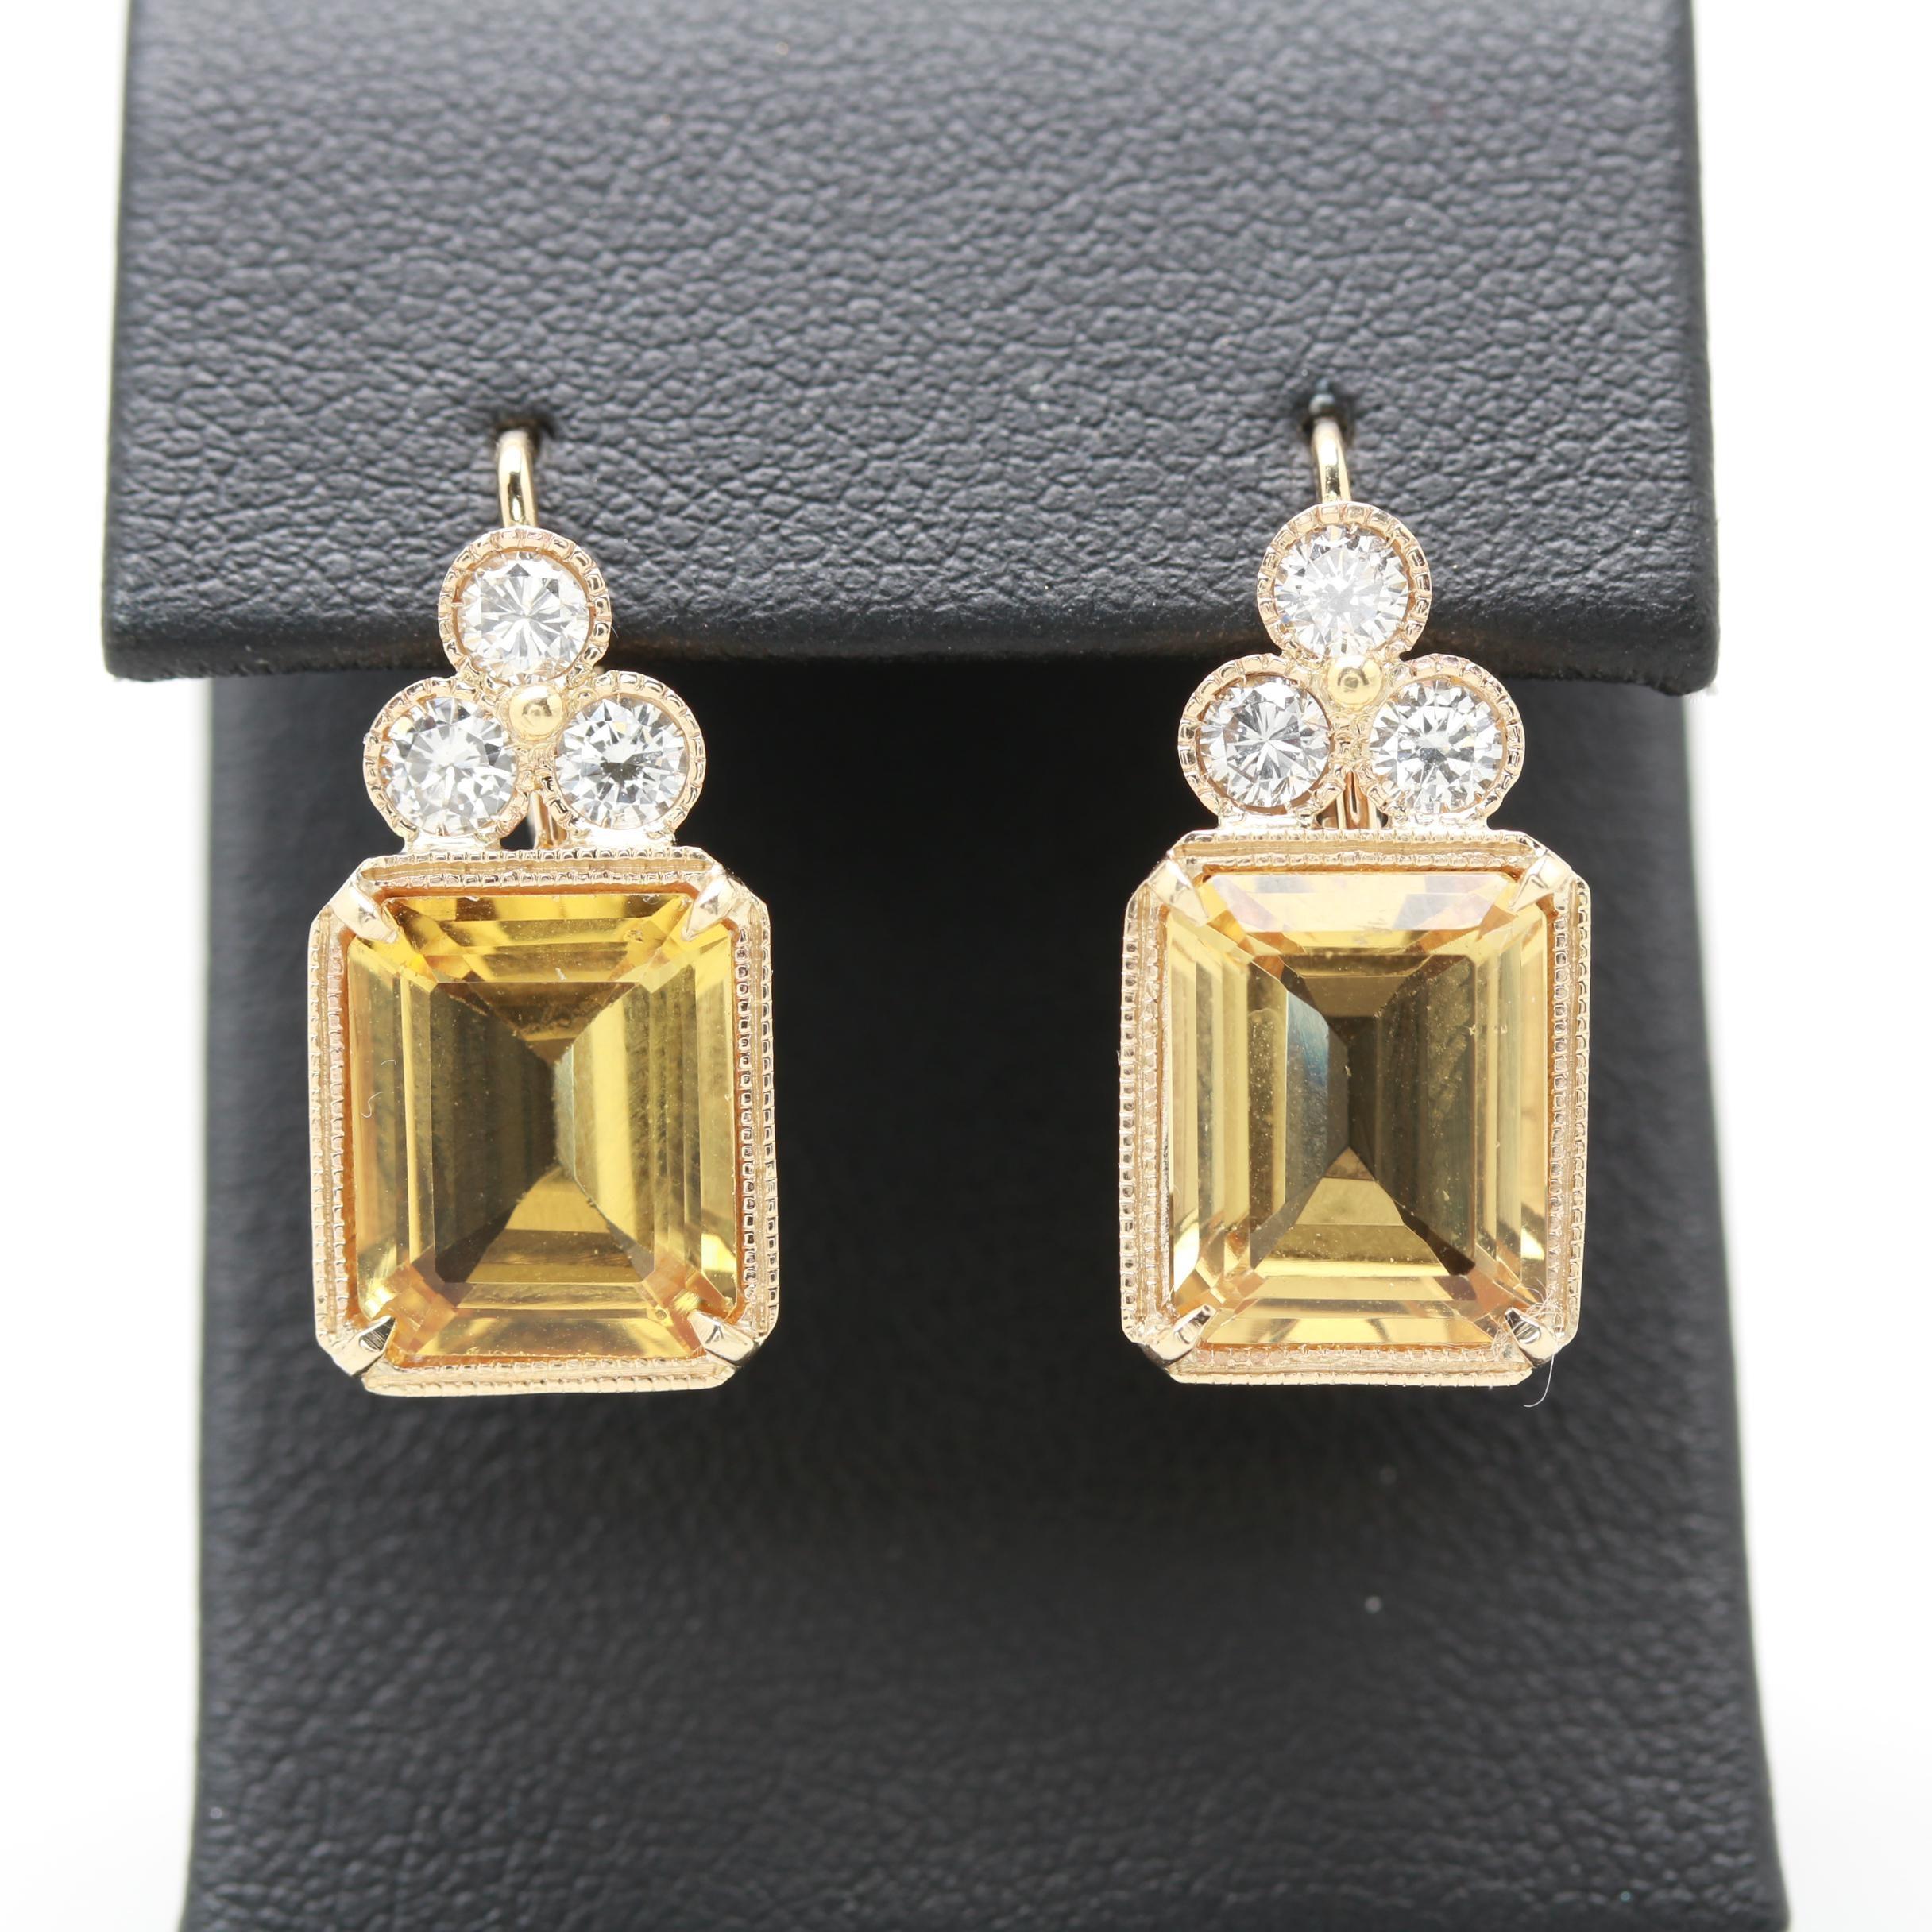 14K Yellow Gold Citrine and Diamond Earrings